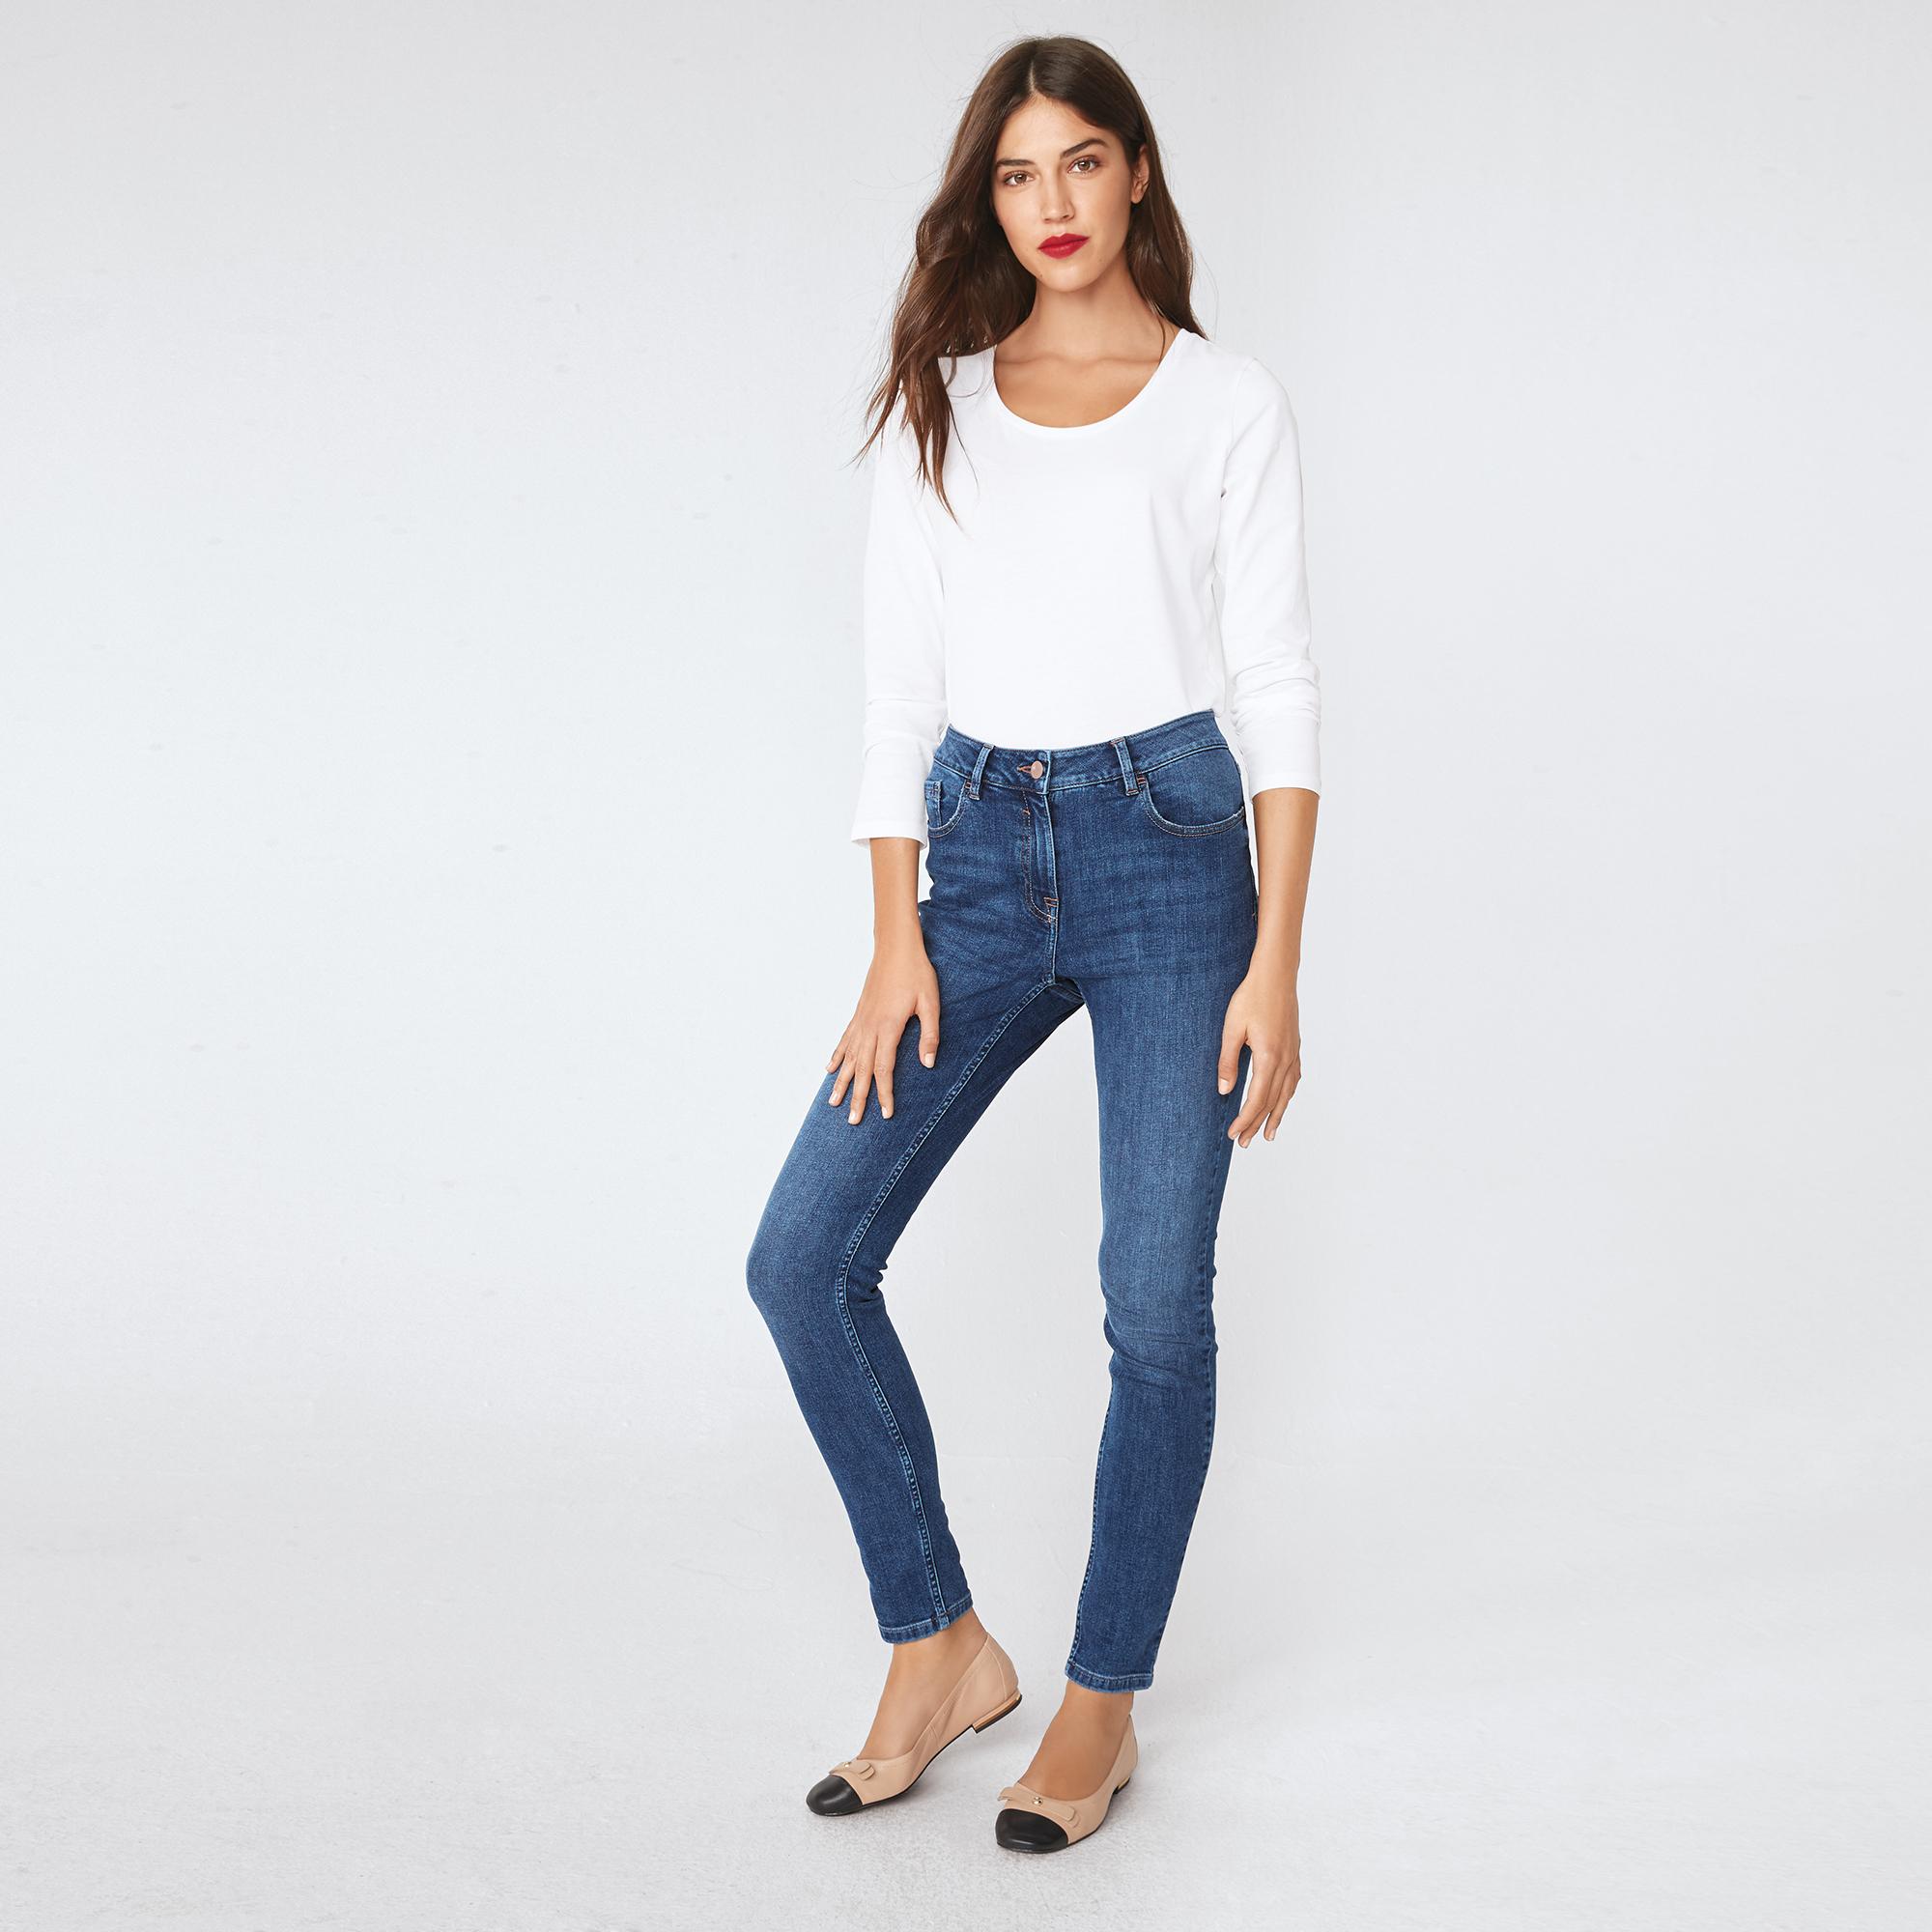 next jeans 1.jpg